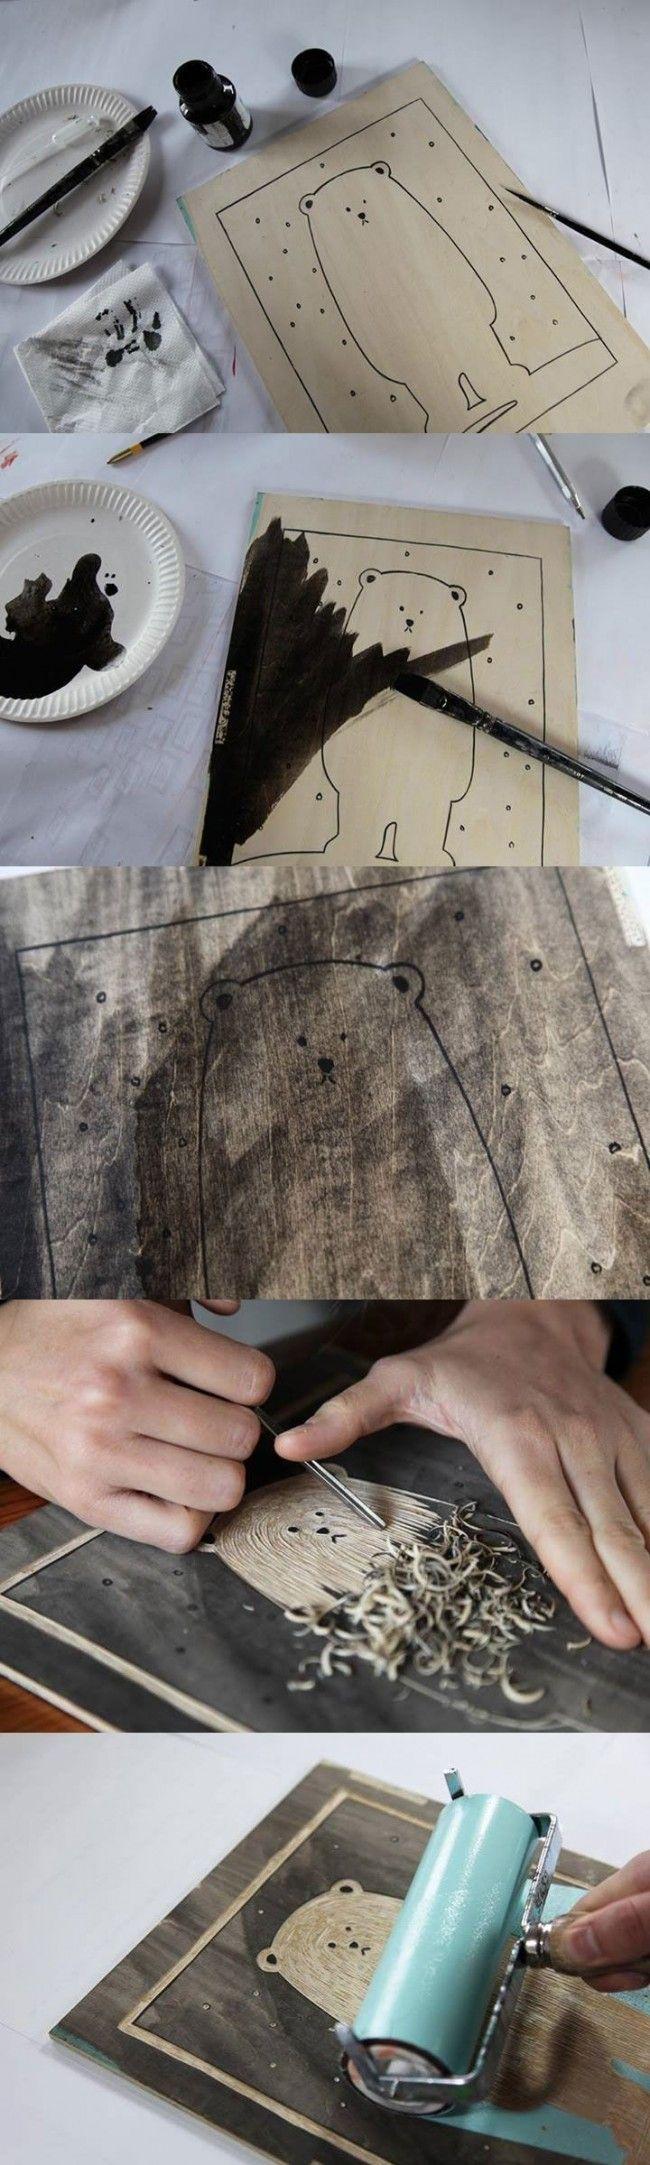 HappyModern.RU   Резьба по дереву (83 фото): фотографии, рисунки, эскизы   http://happymodern.ru